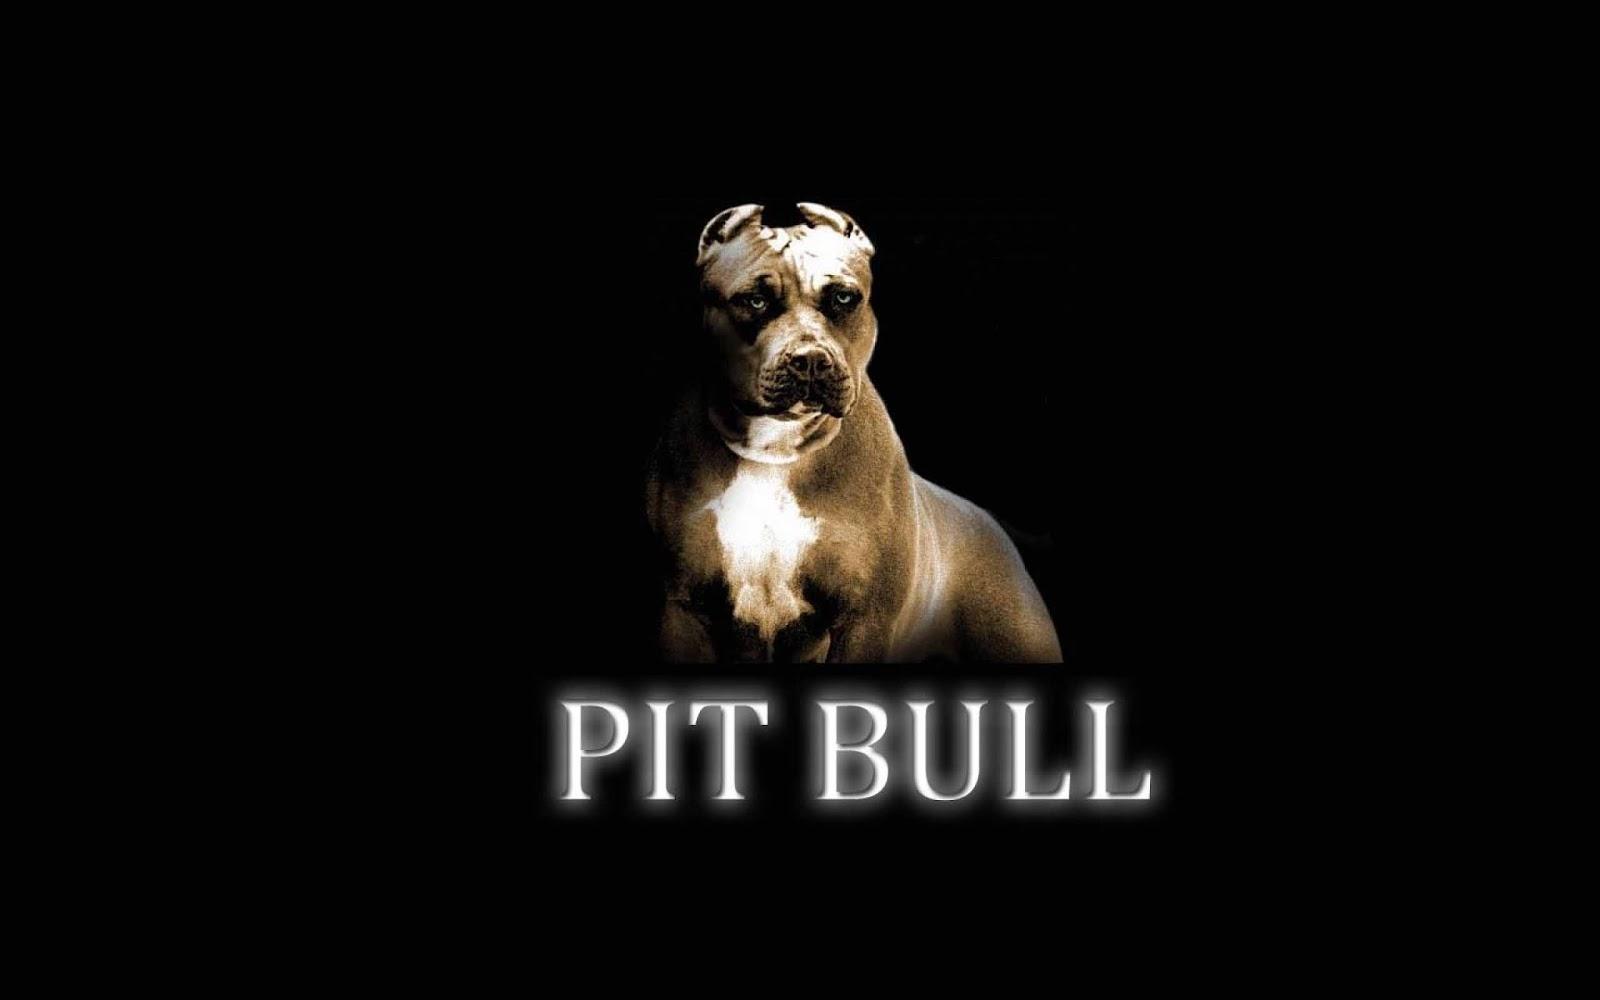 HD Wallpapers Pitbull Dog Wallpapers 1600x1000